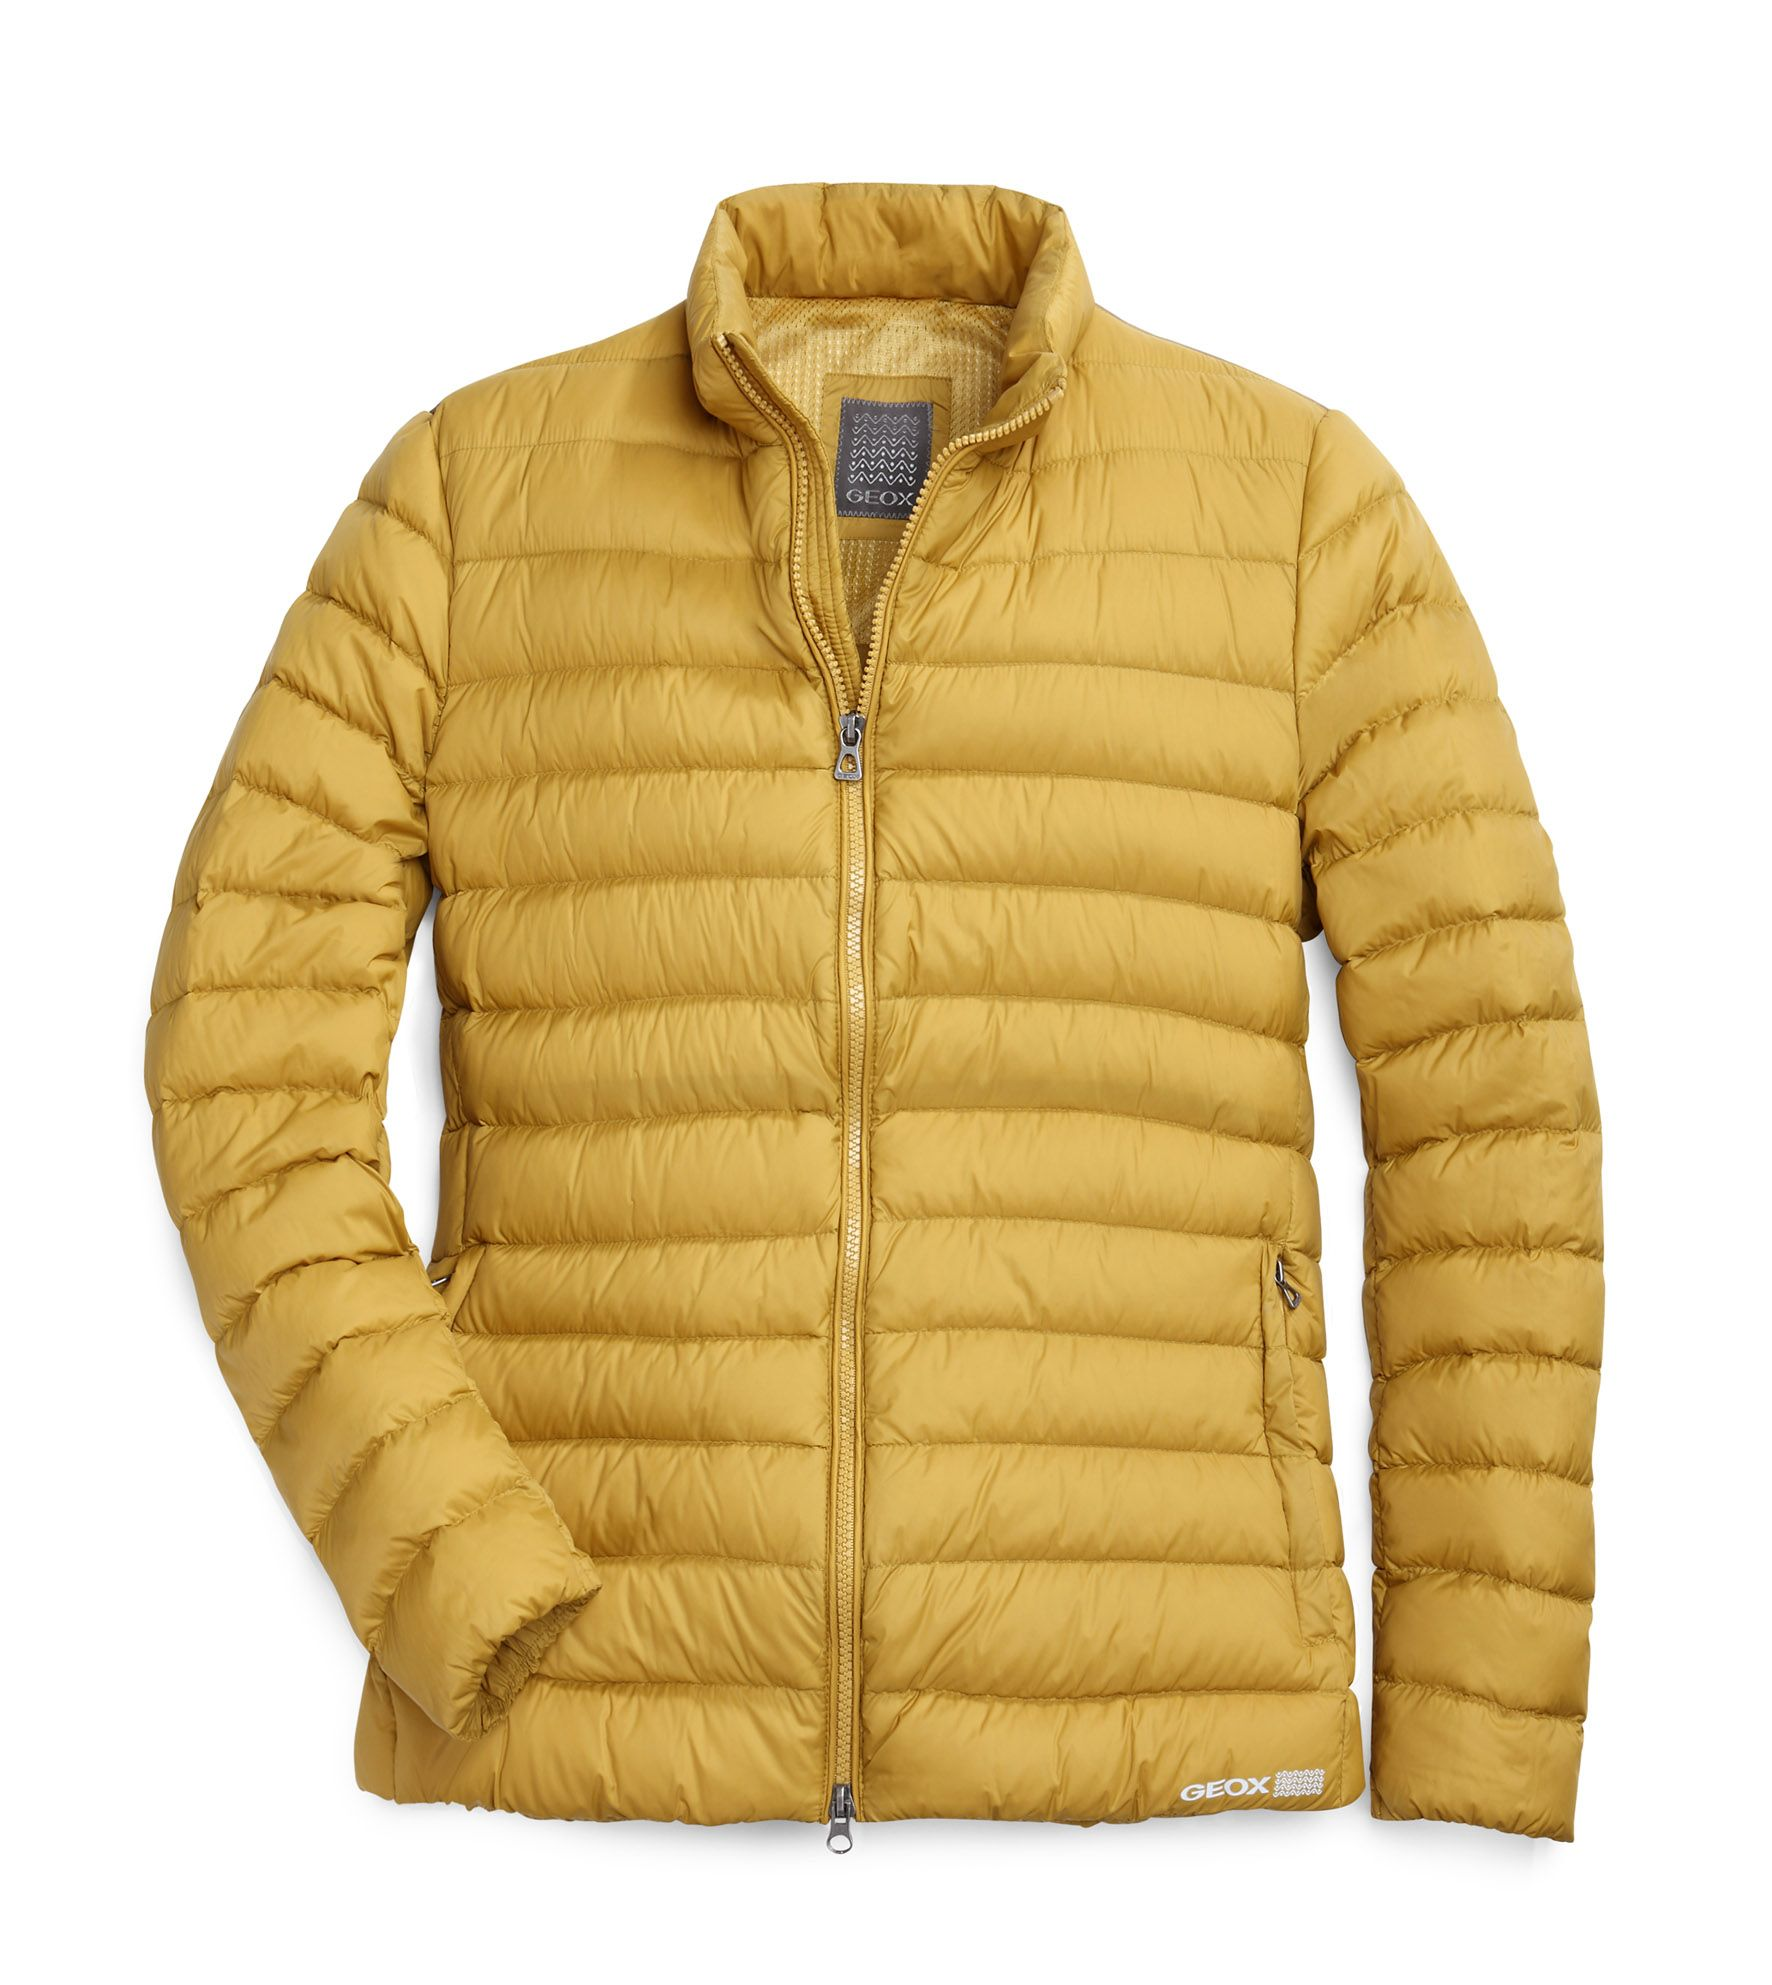 c3cea1c04d GEOX Man Quilted Jacket | Chestii de purtat